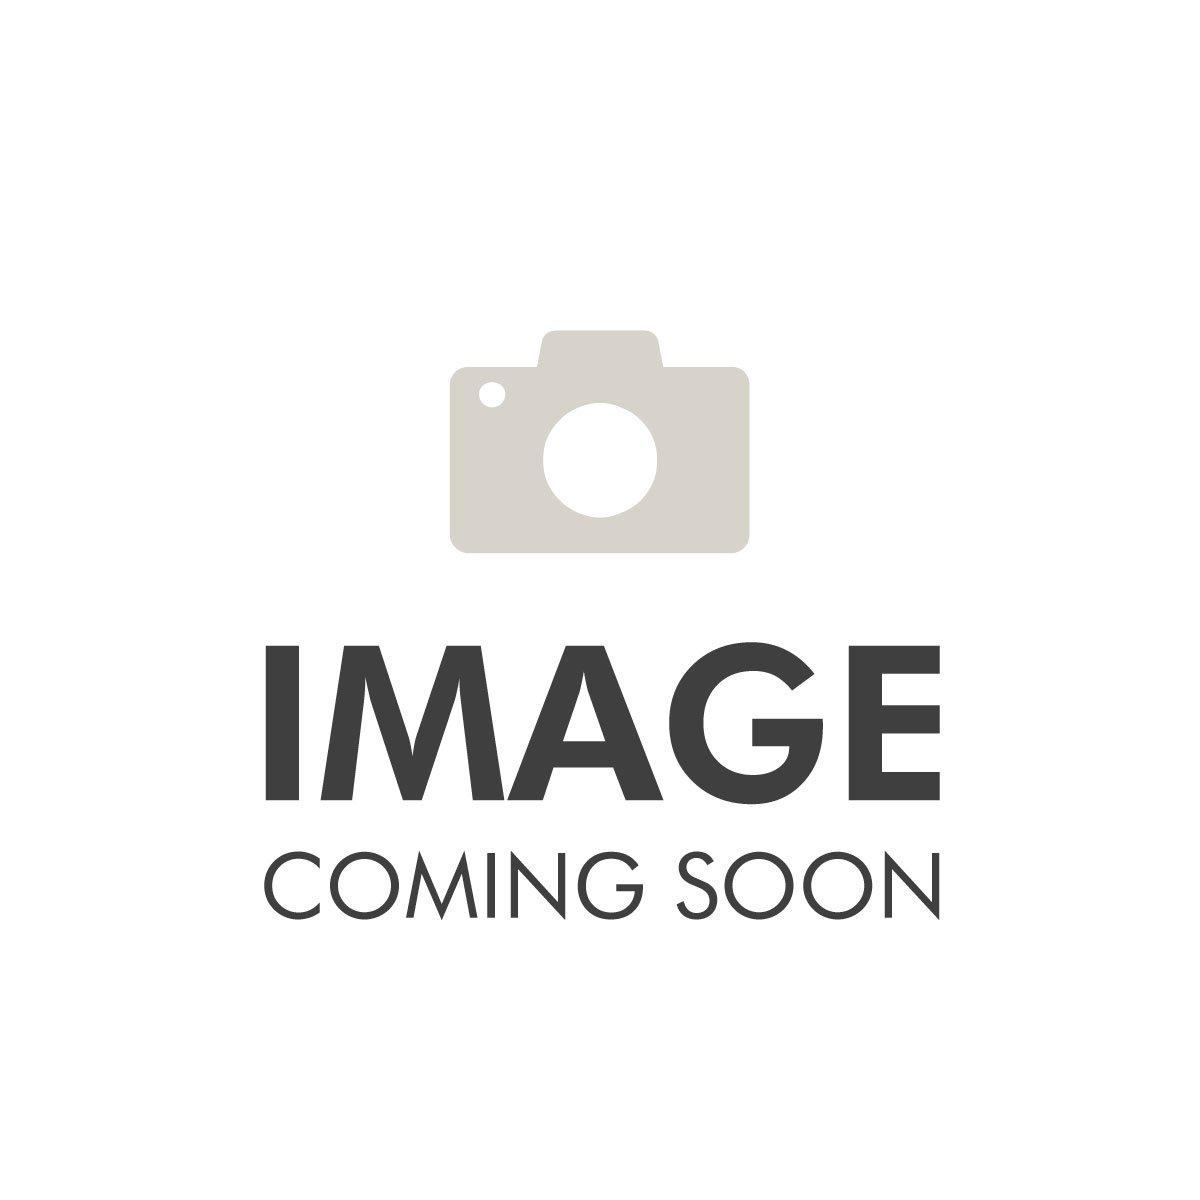 L'Oreal Loreal L´Oreal Professionnel Expert Serie Sensi Balance Shampoo 500ml